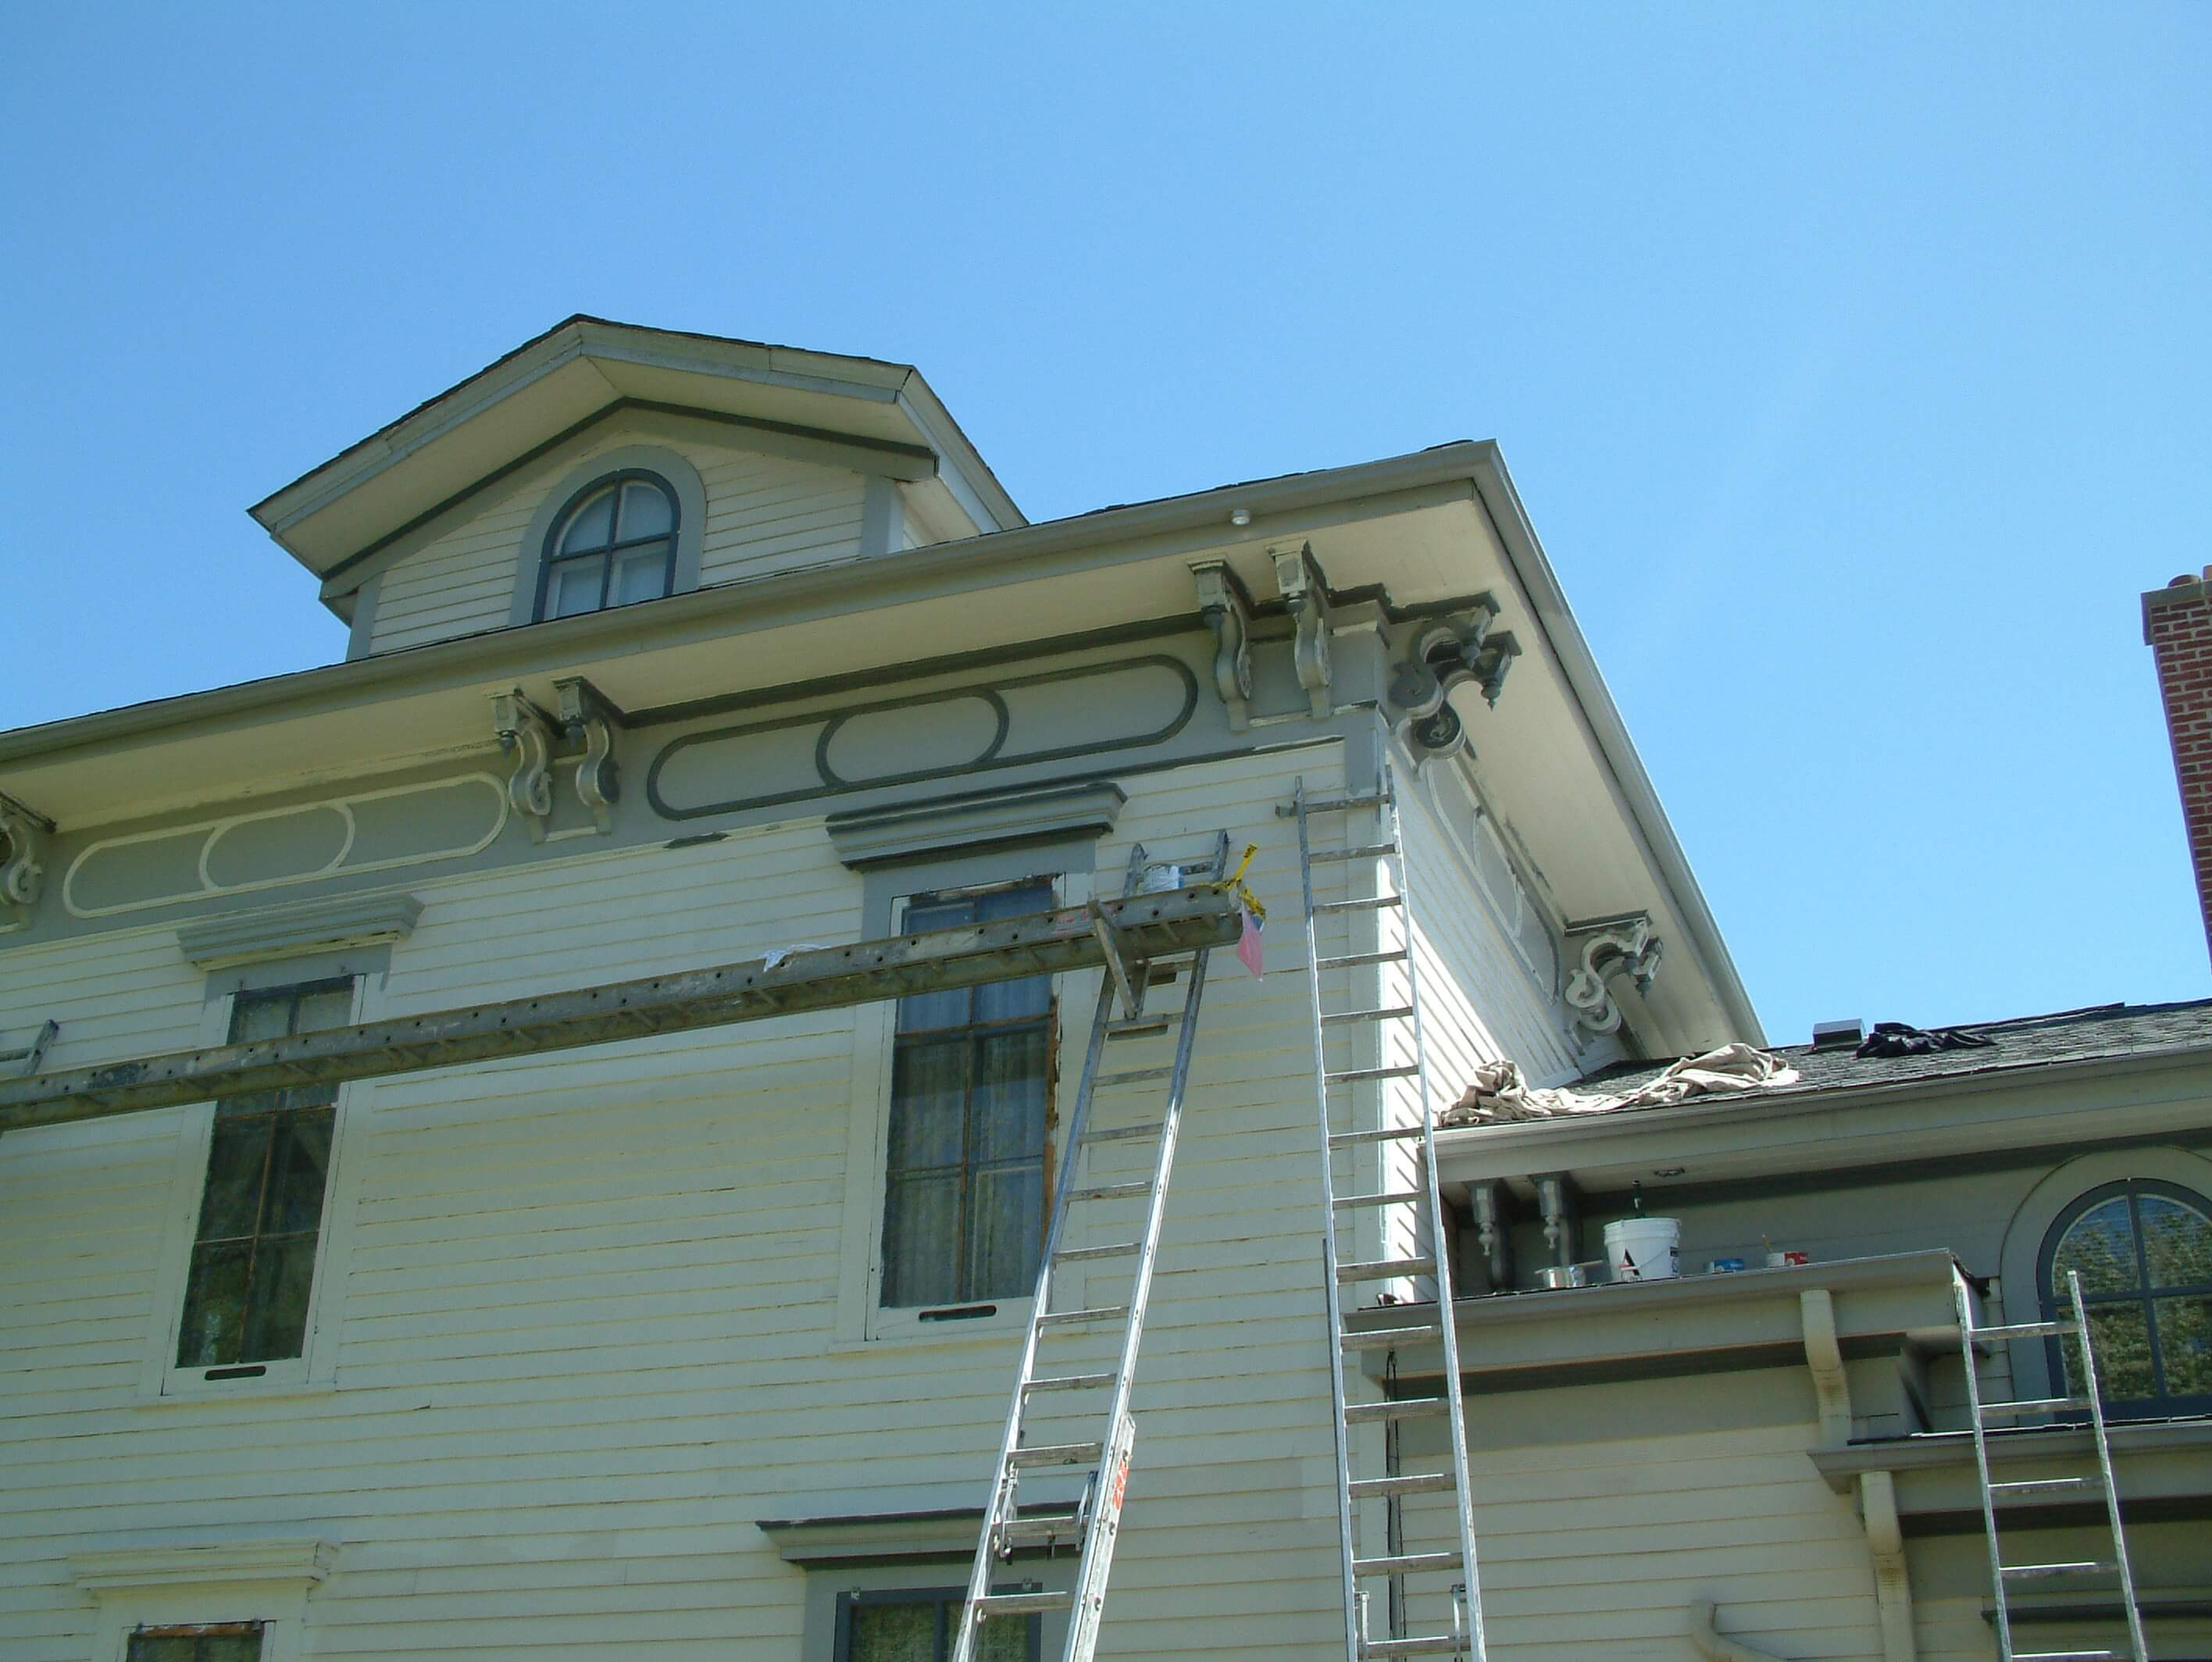 Broken Window Glass Noble Seymour Crippen House Norwood Park